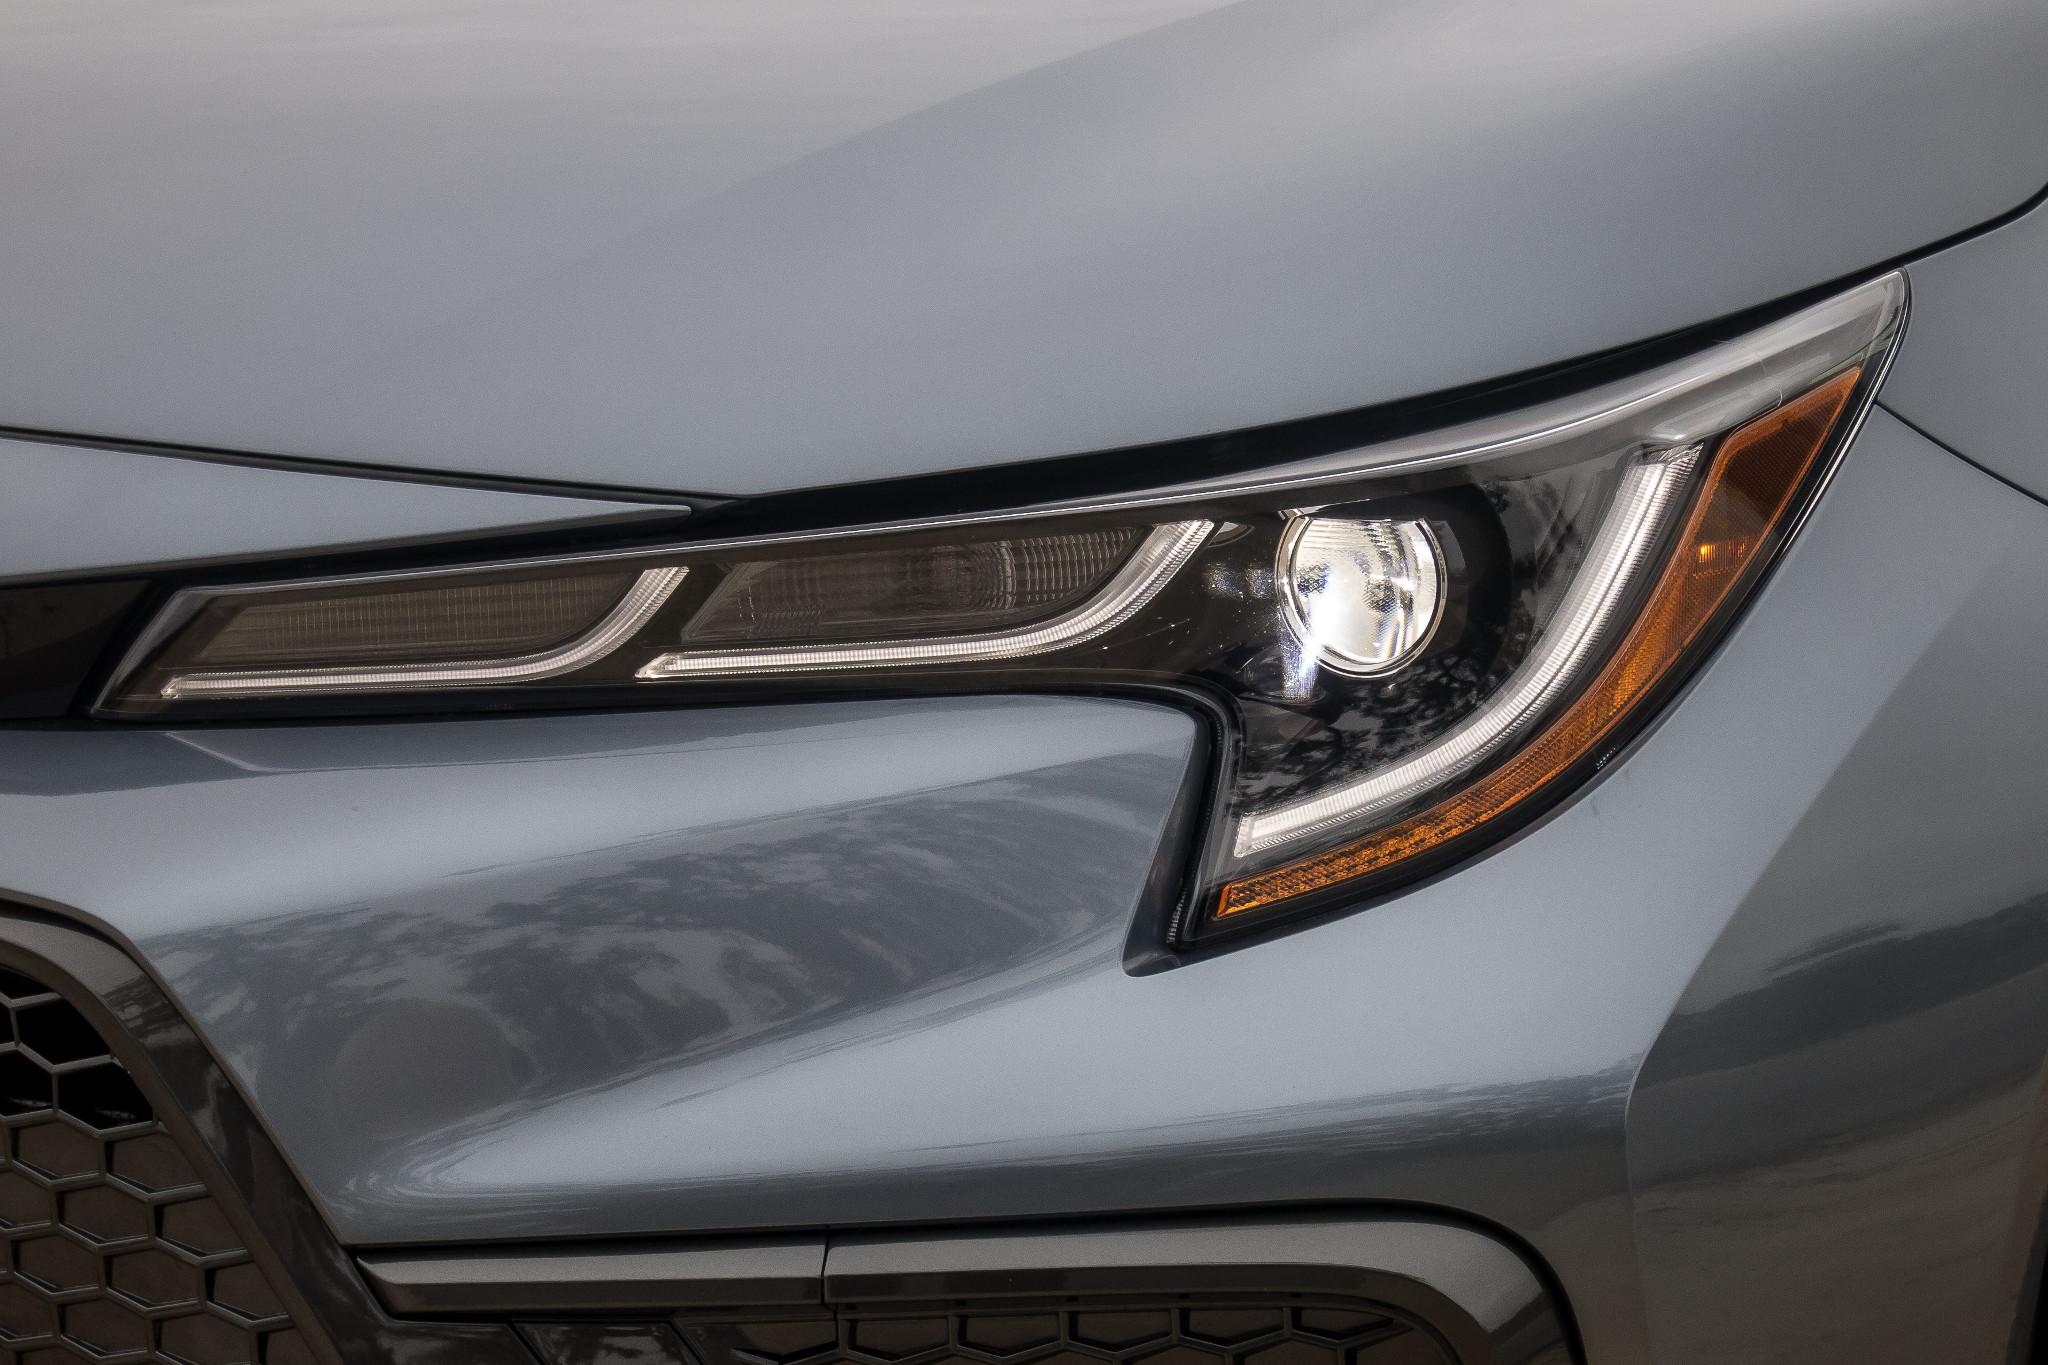 05-toyota-corolla-2020-exterior--front--grey--headlights.jpg